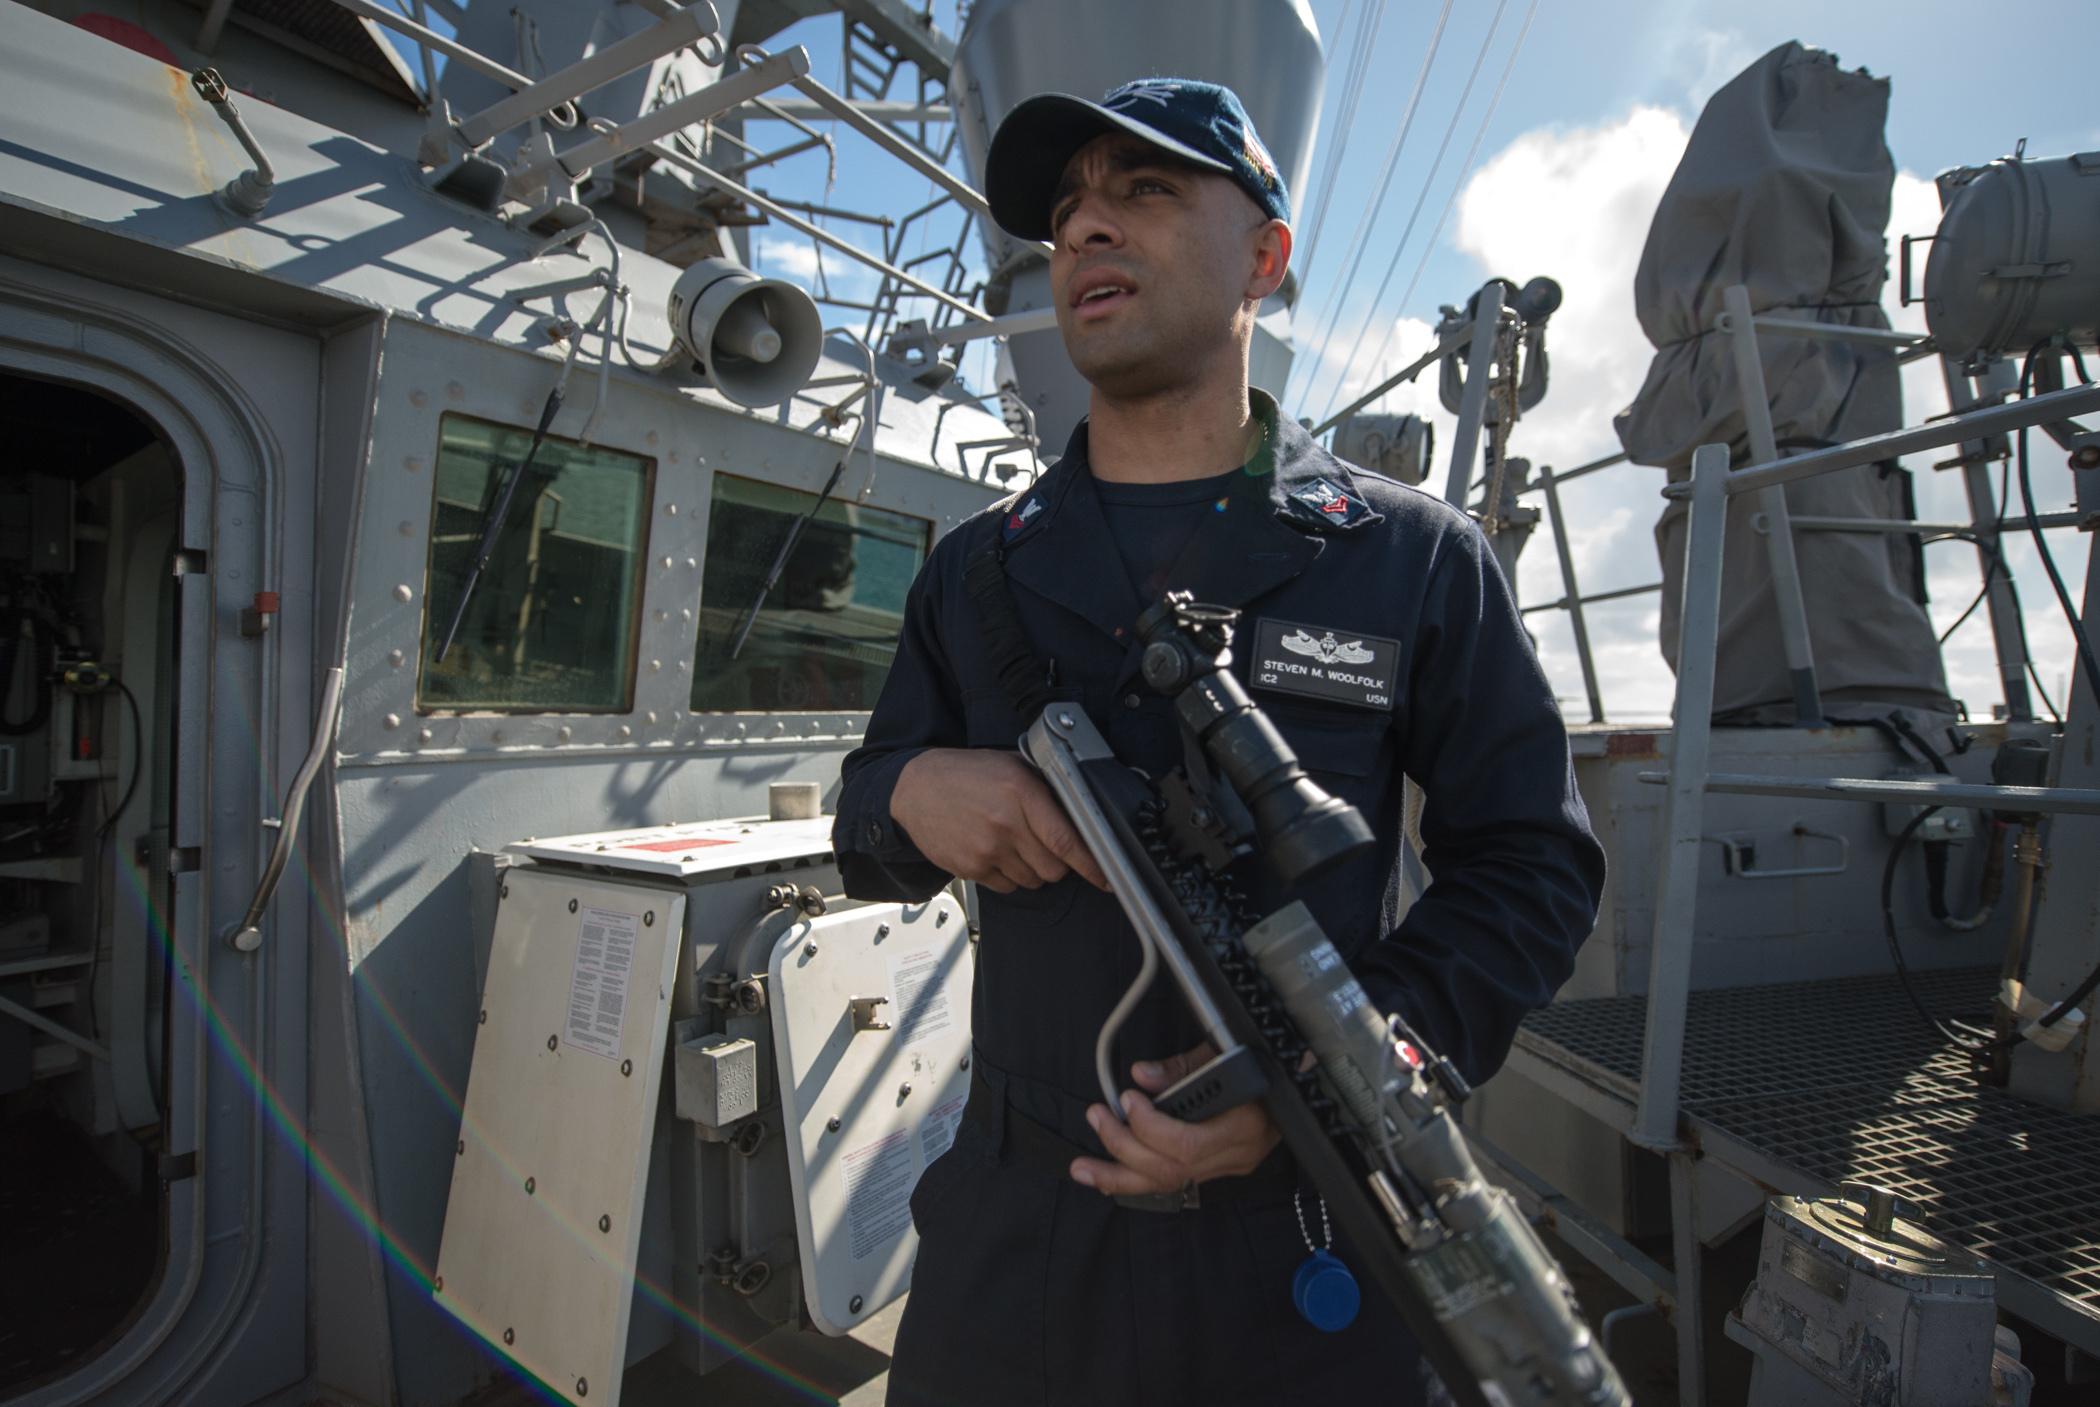 Petty Officer 2nd Class Karolina Oseguera